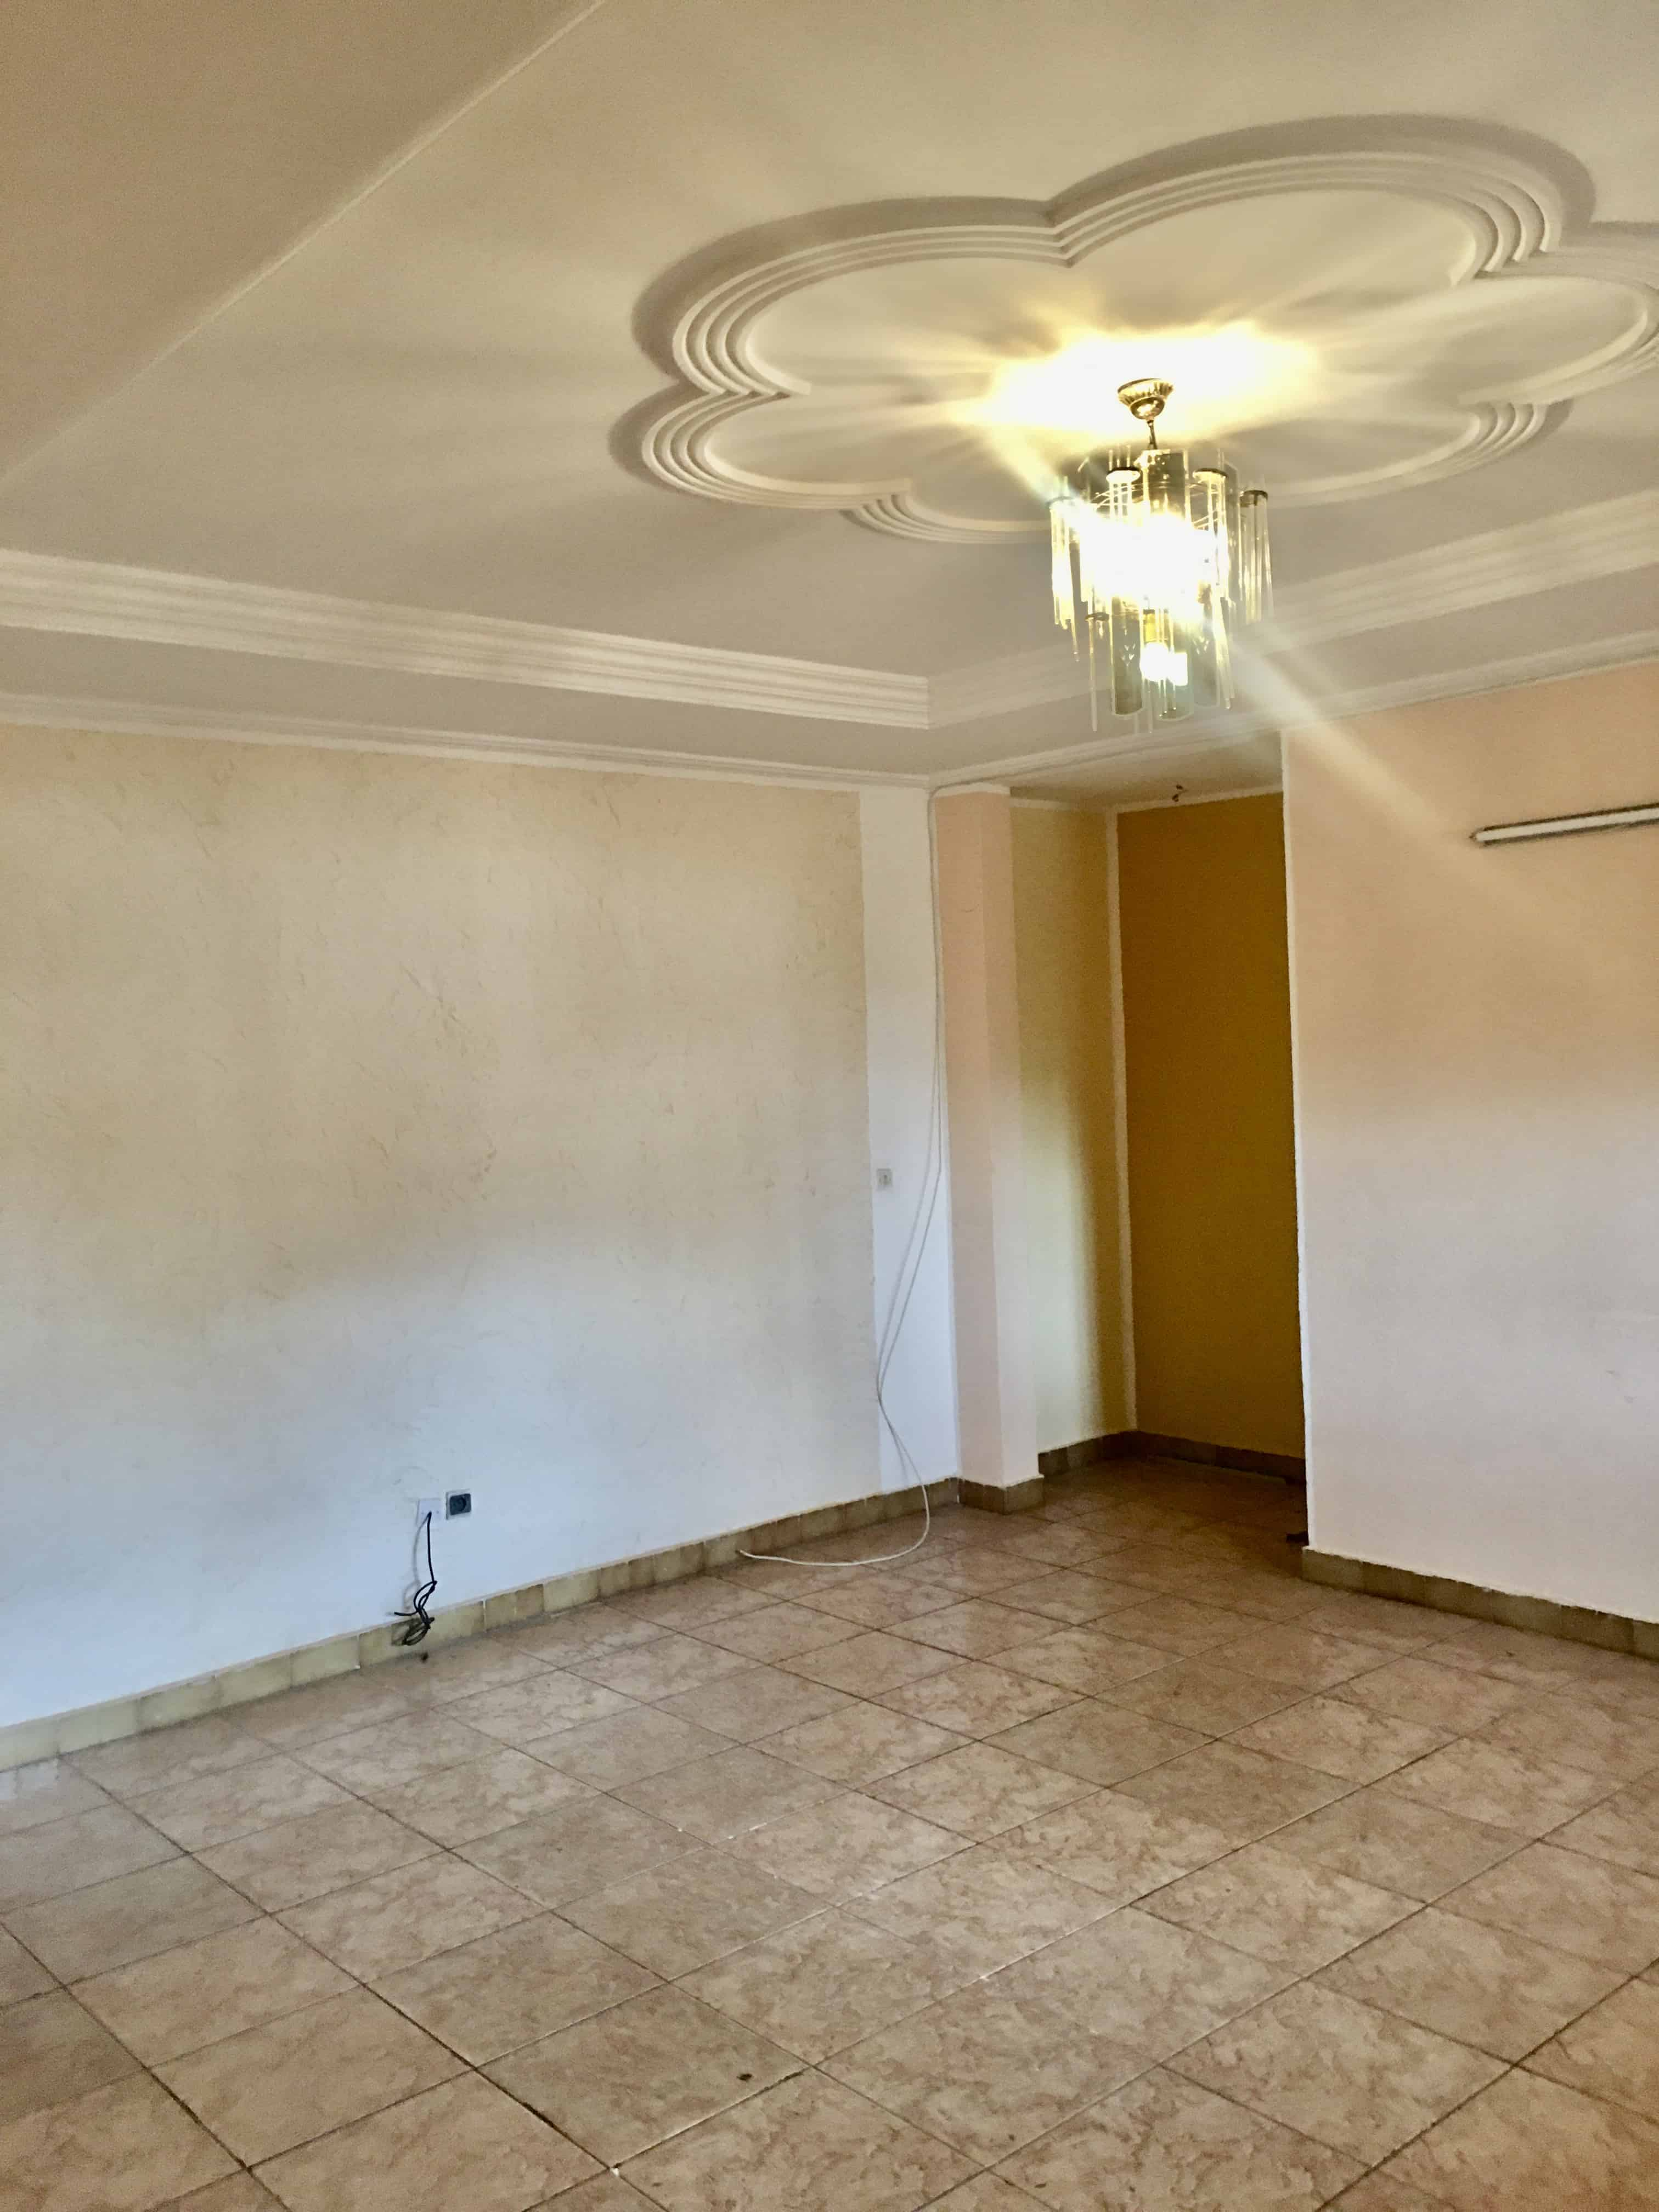 Apartment to rent - Yaoundé, Bastos, Carrefour - 1 living room(s), 3 bedroom(s), 2 bathroom(s) - 350 000 FCFA / month